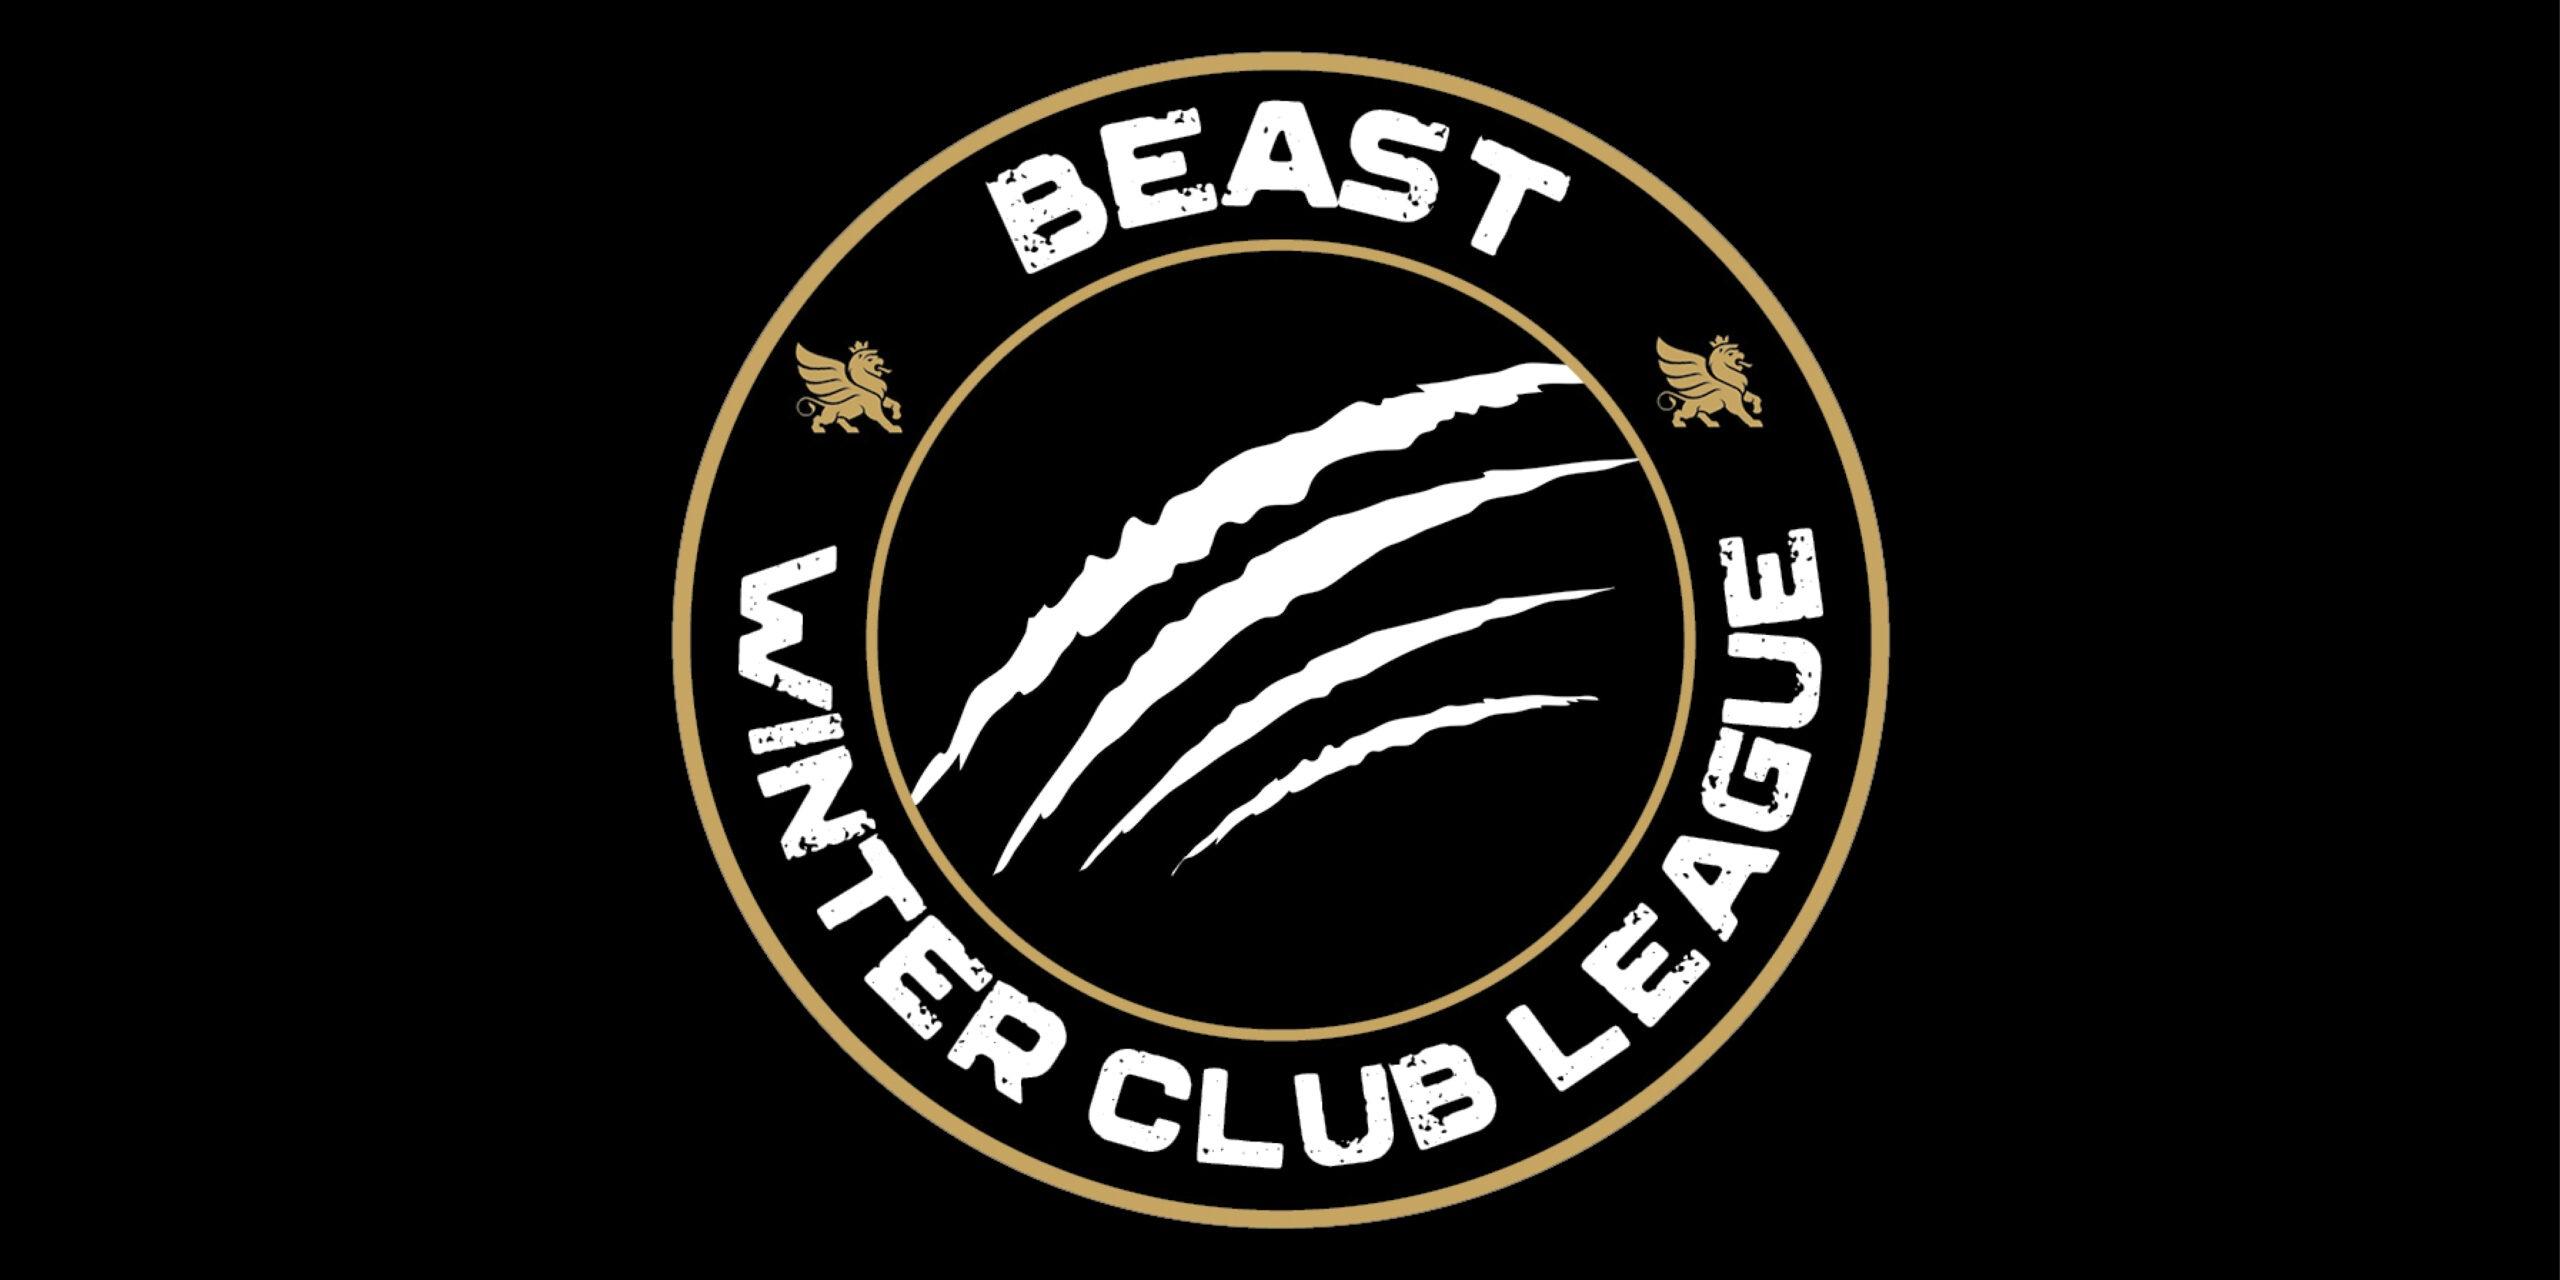 BEAST WINTER CLUB Lacrosse